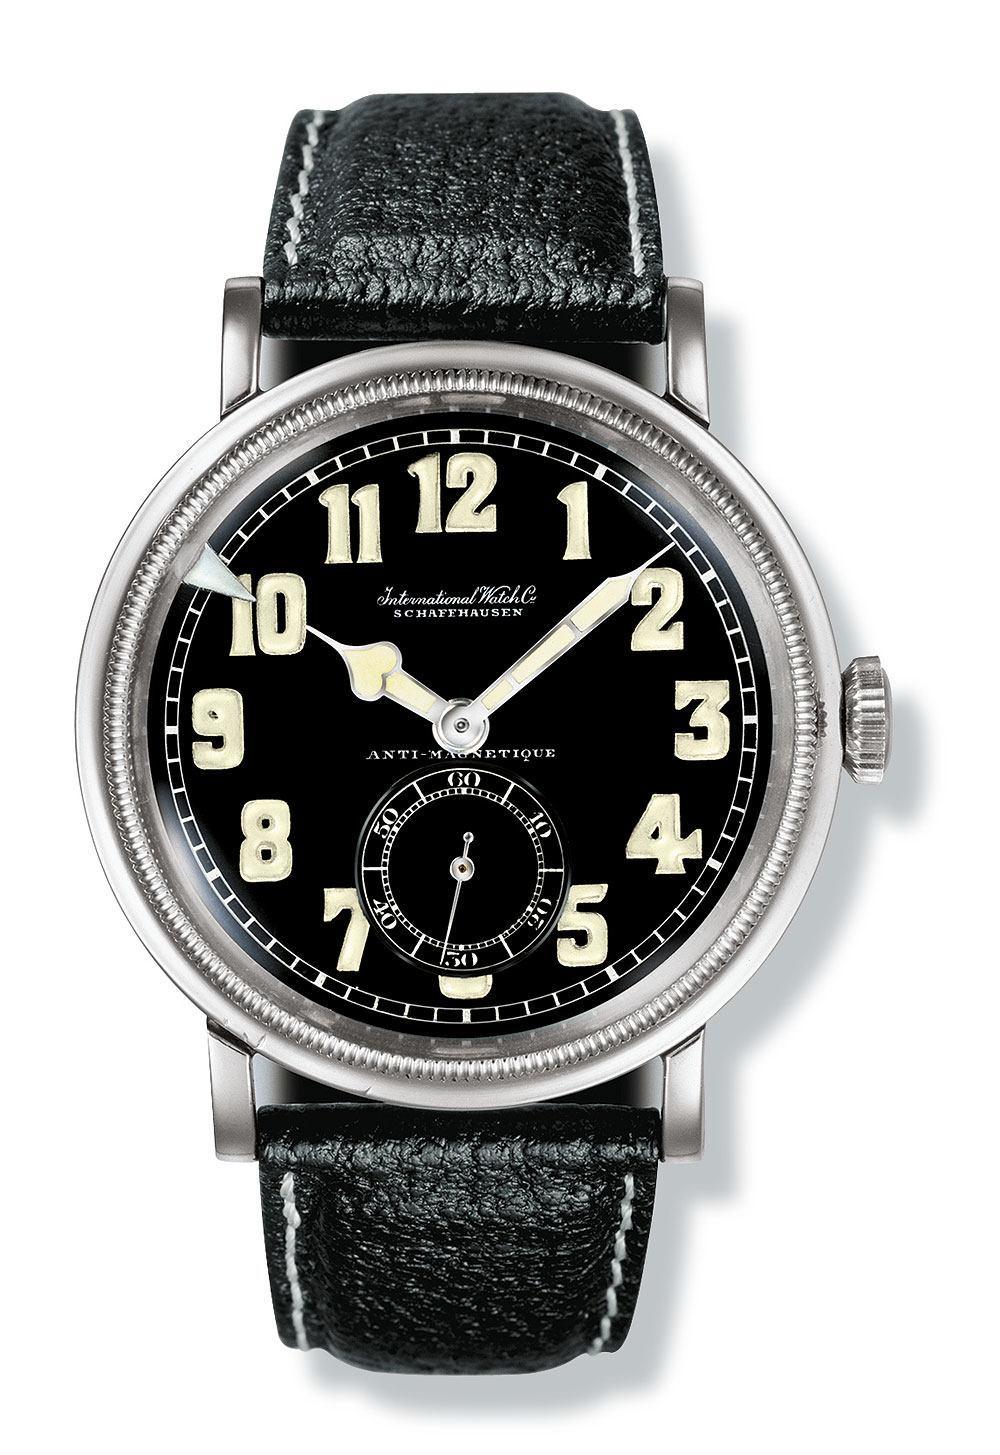 IWC_Watch_for_Pilots_1936_1000.jpg